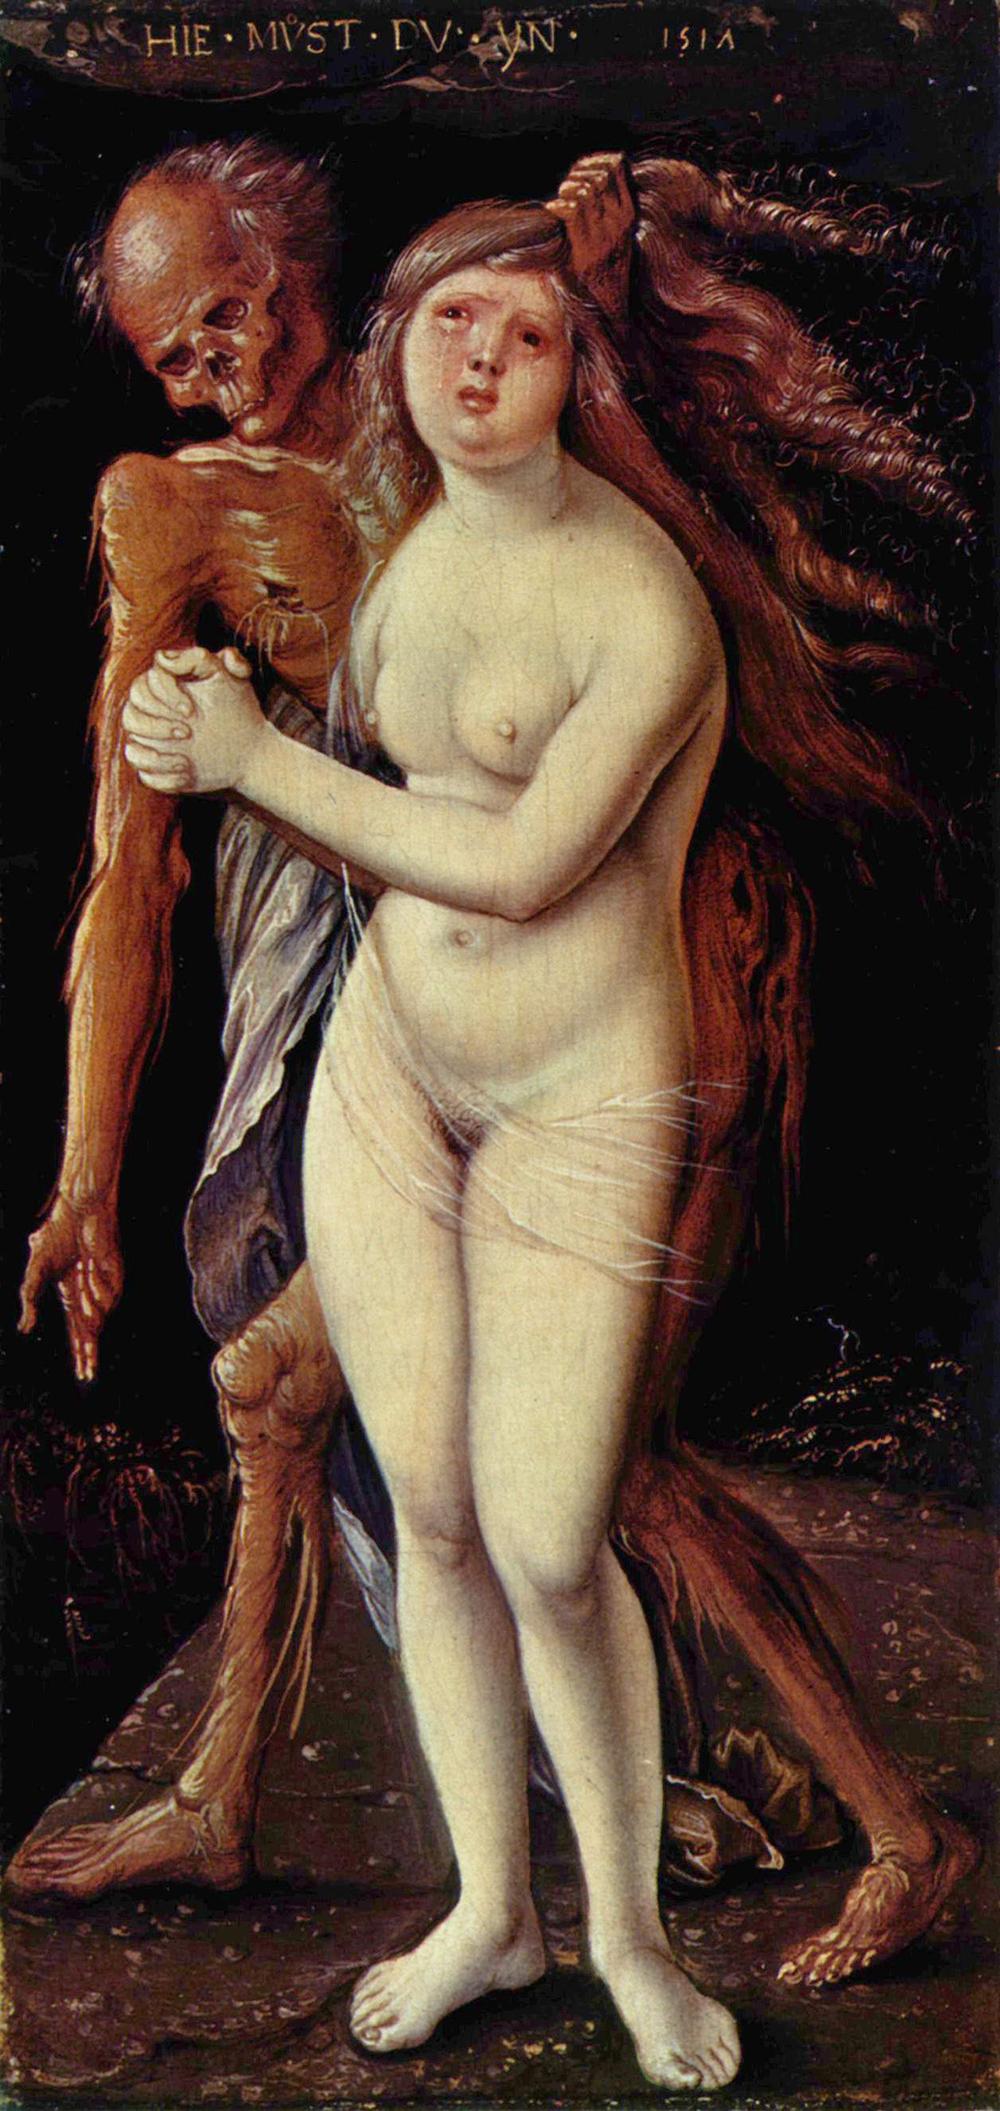 04. Hans Baldung Grien. 1518-20 Death and the Maiden.